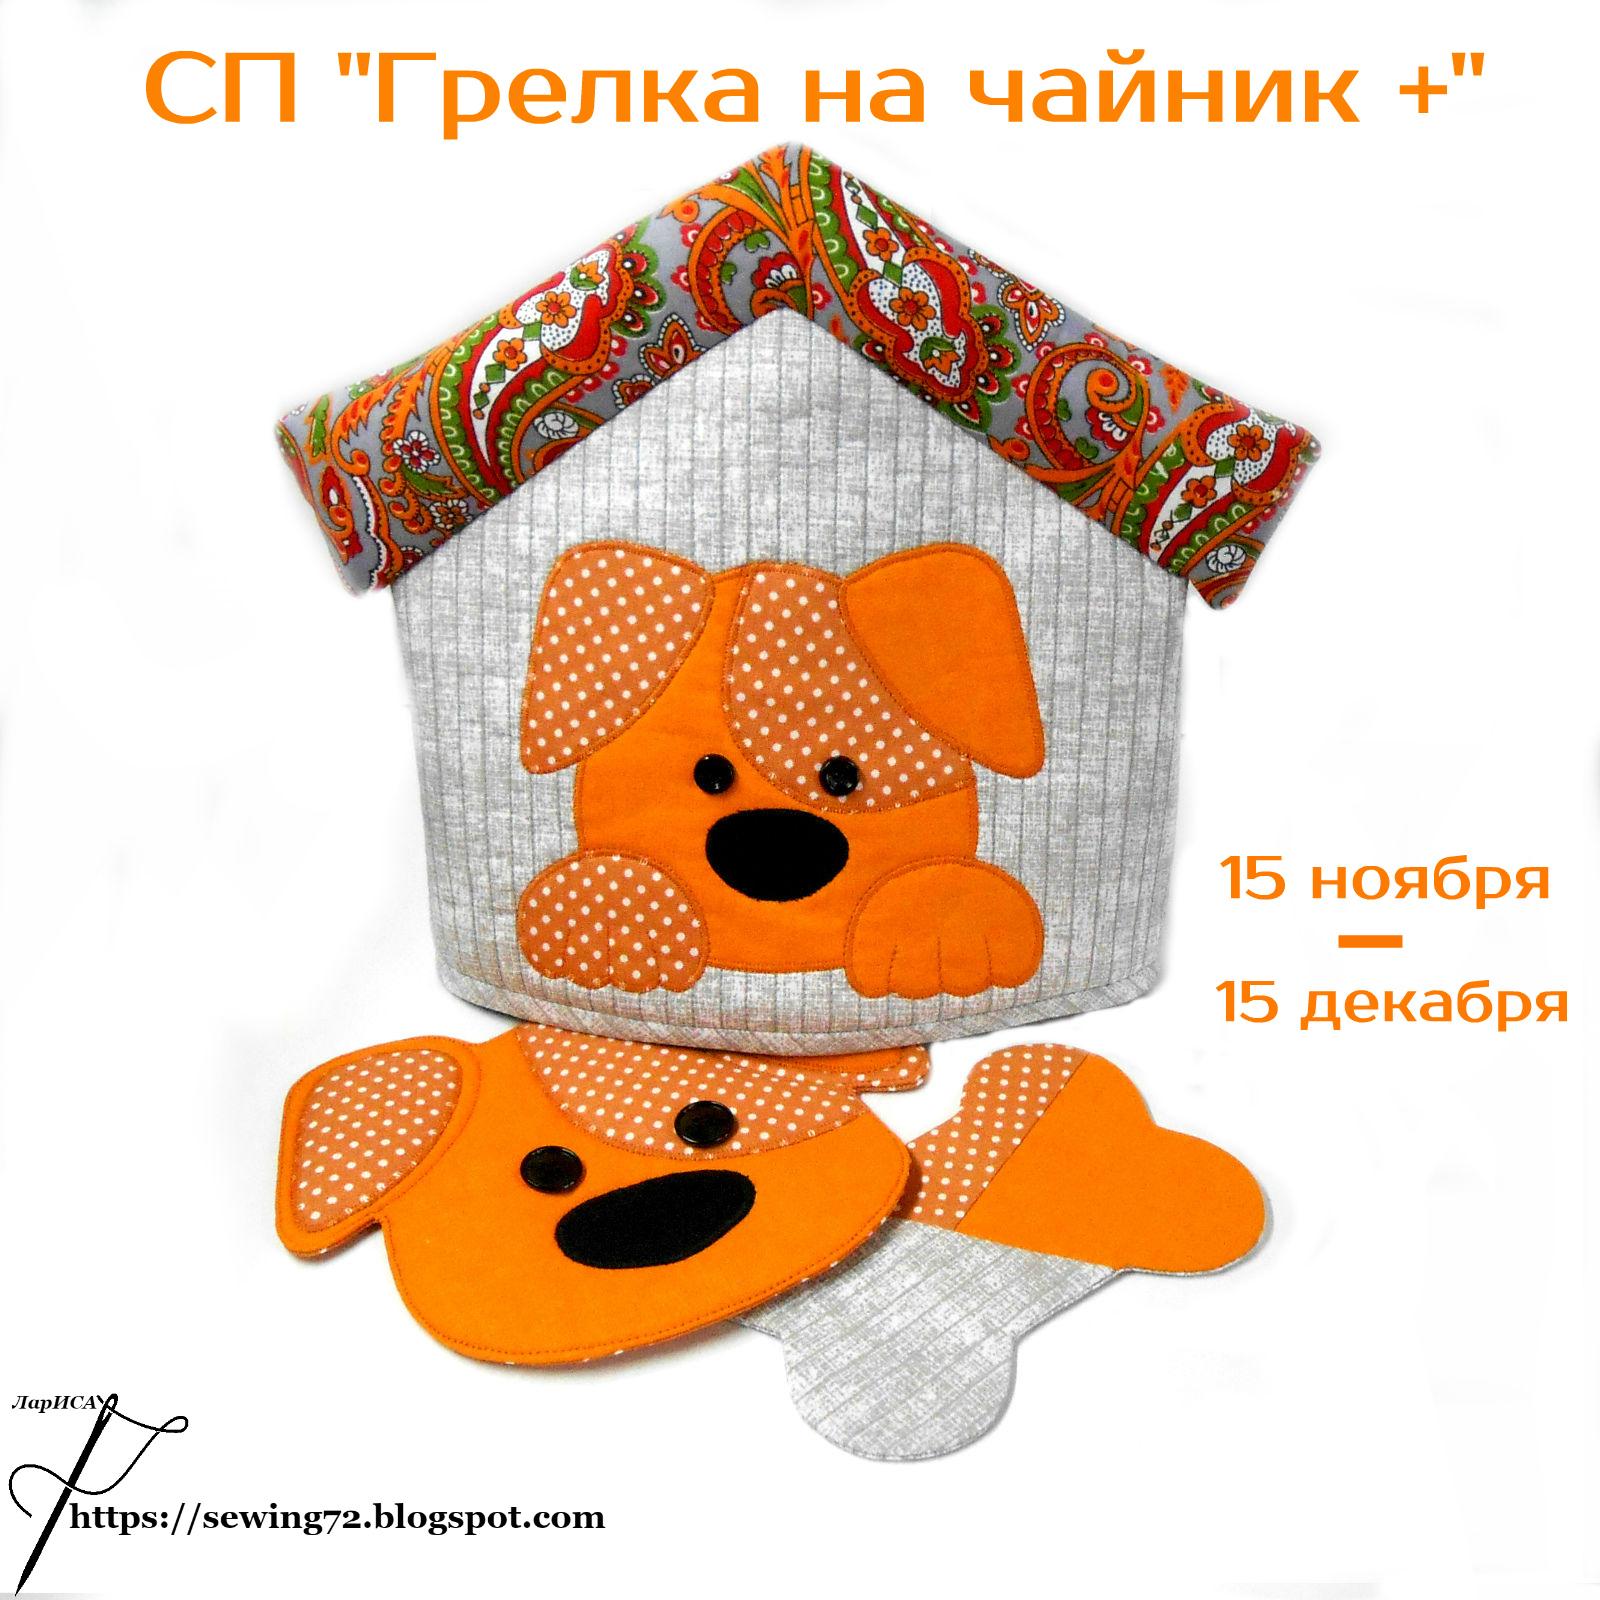 Готовим подарки к НГ)